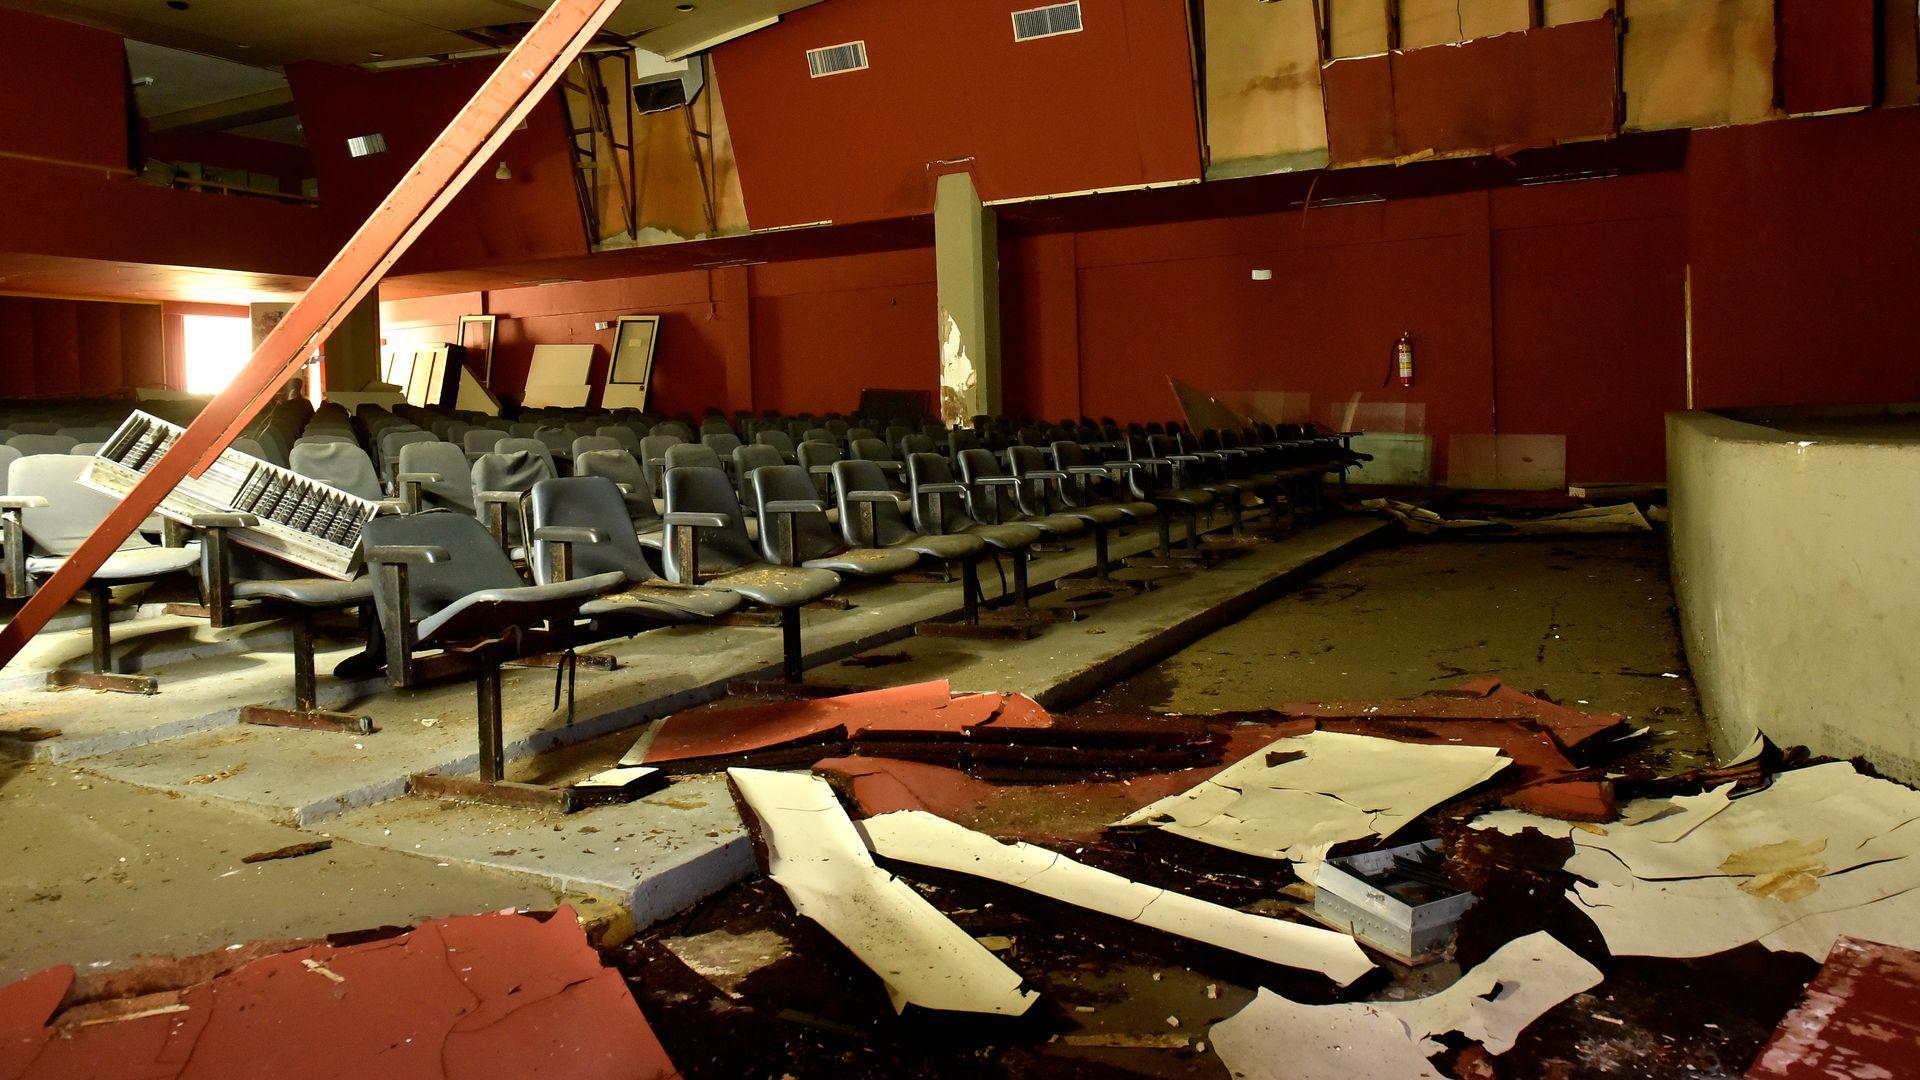 Cultura do abandono, Teatro Carmélia M. de Souza